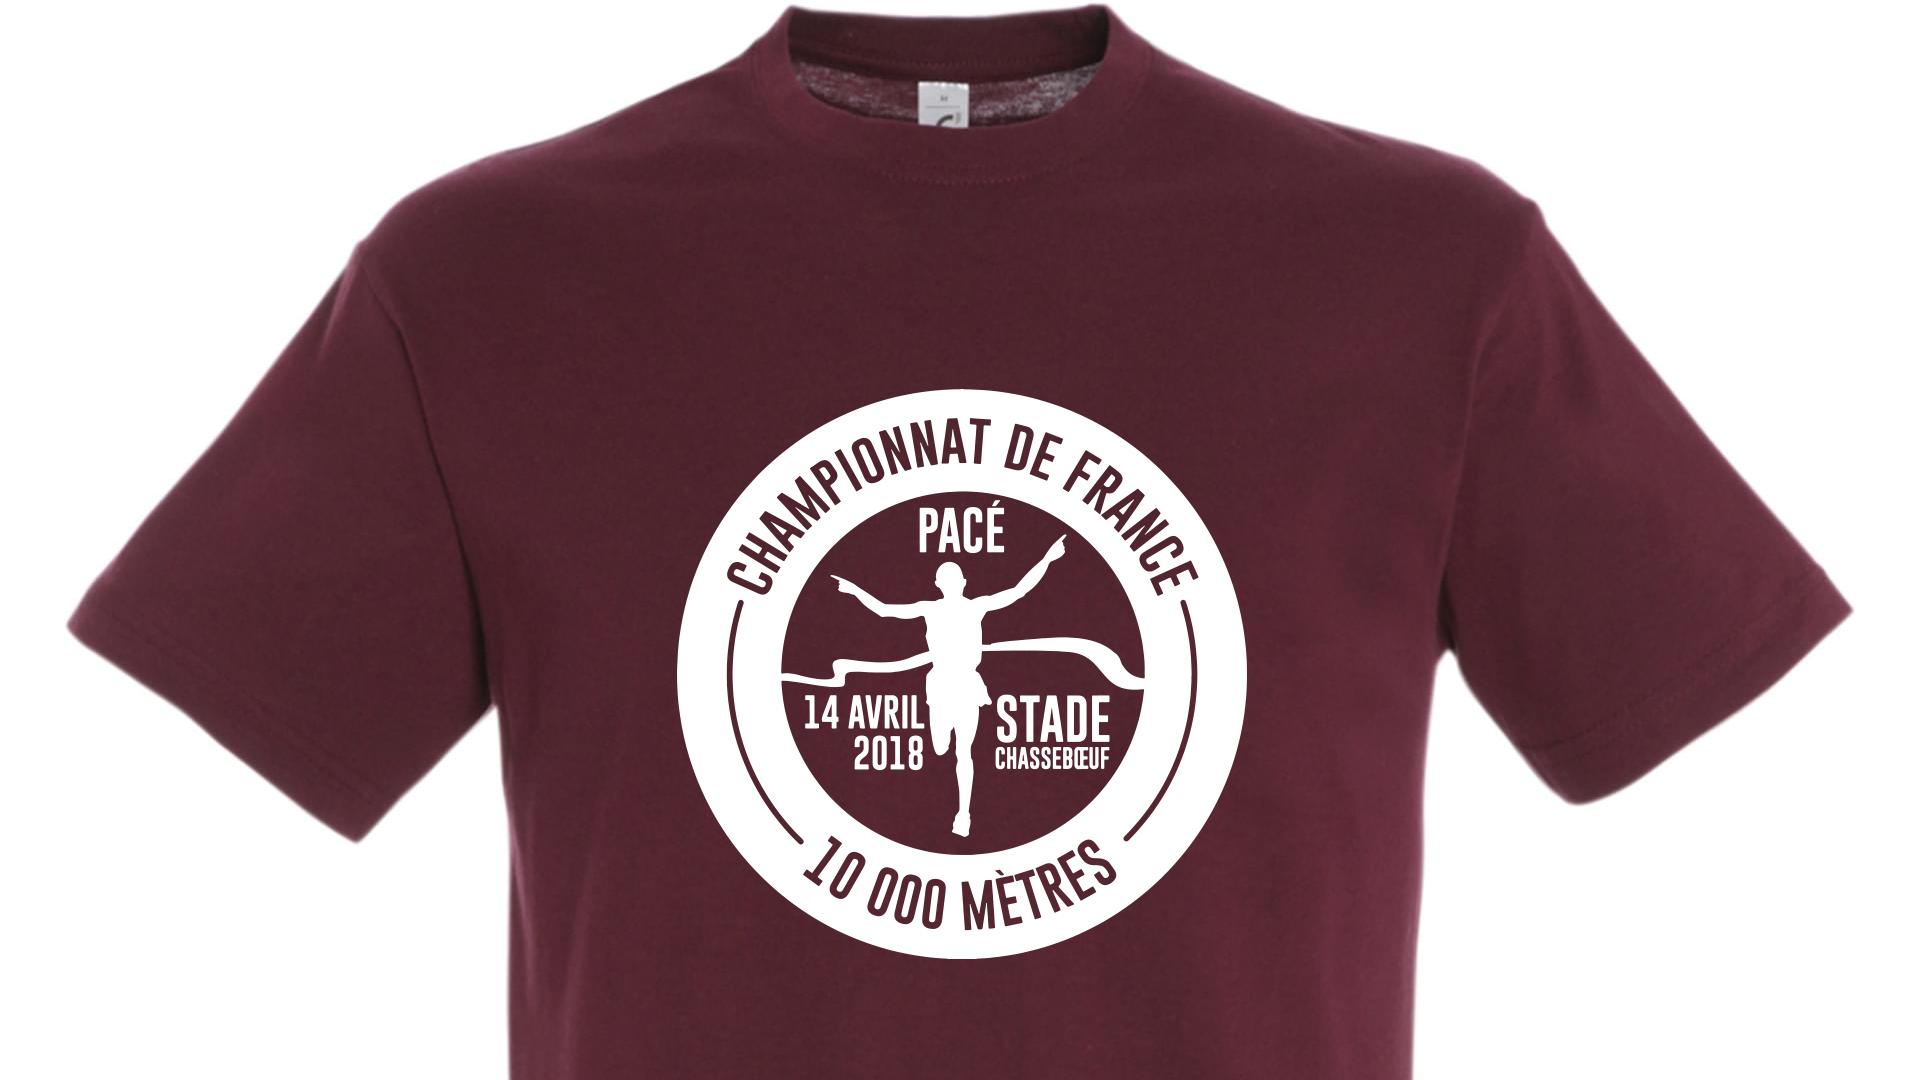 Tee-shirt_france_10000_2O18-1518022611.png